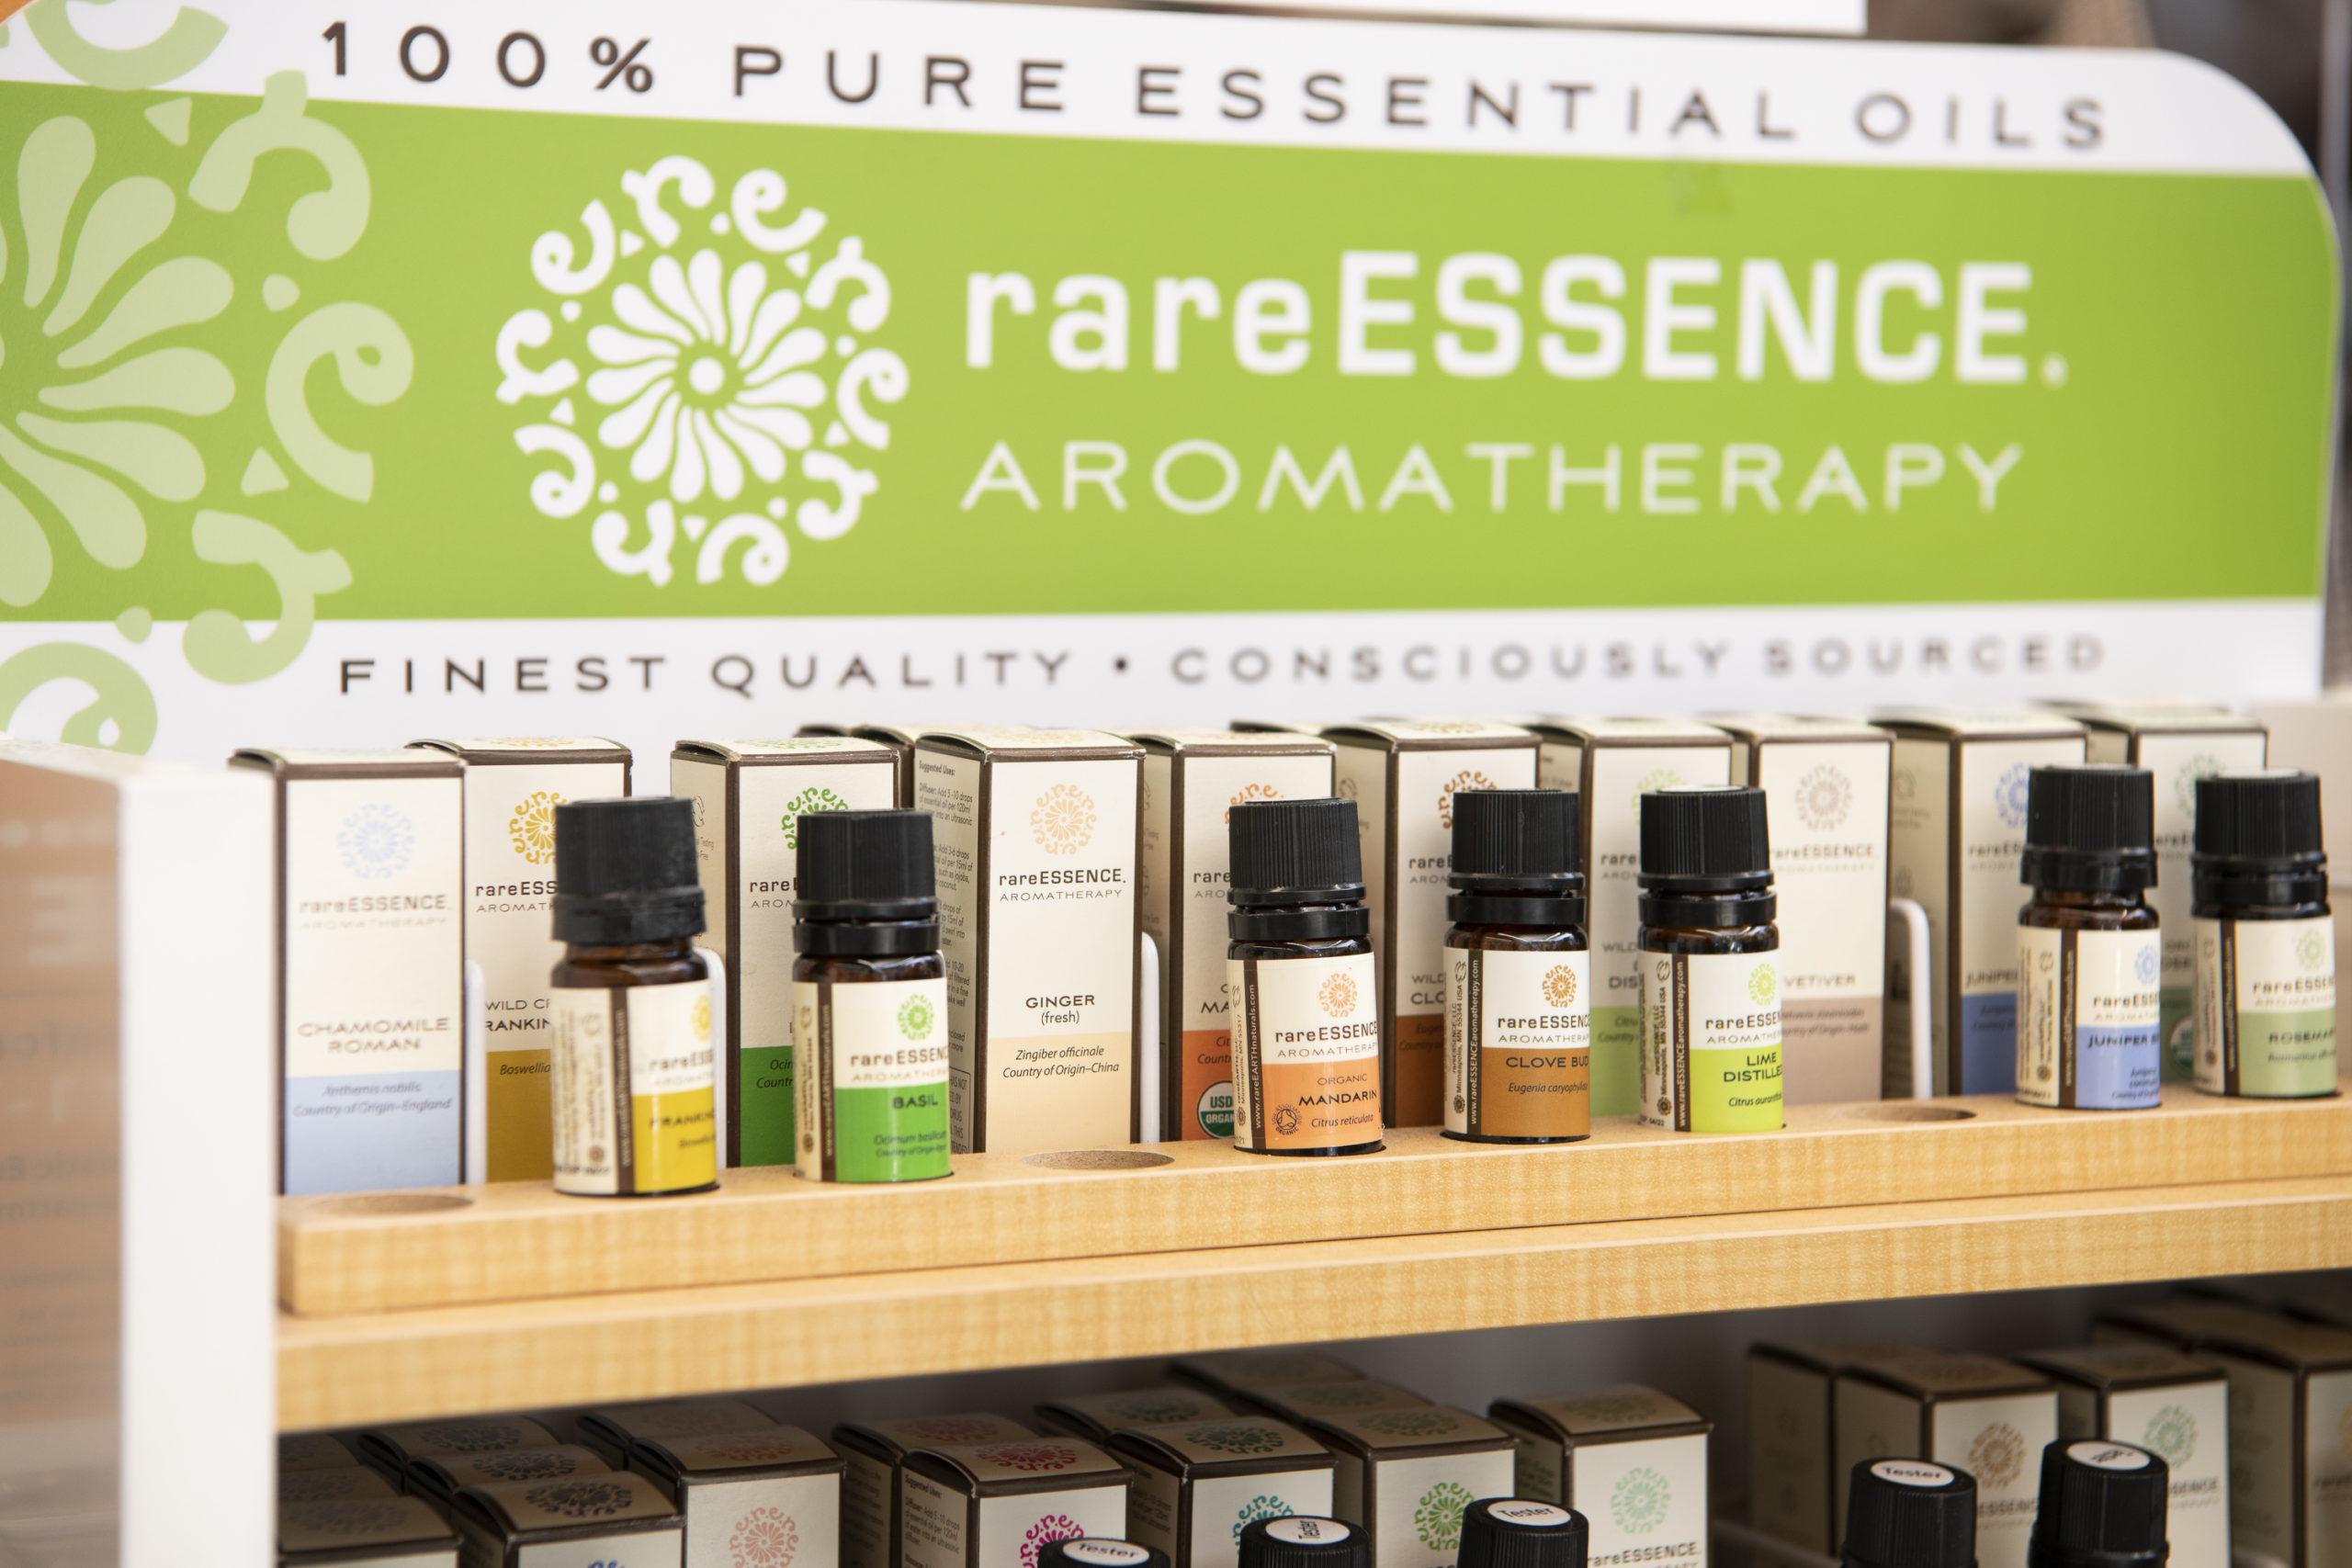 Apthorp-Pharmacy Aromatherapy